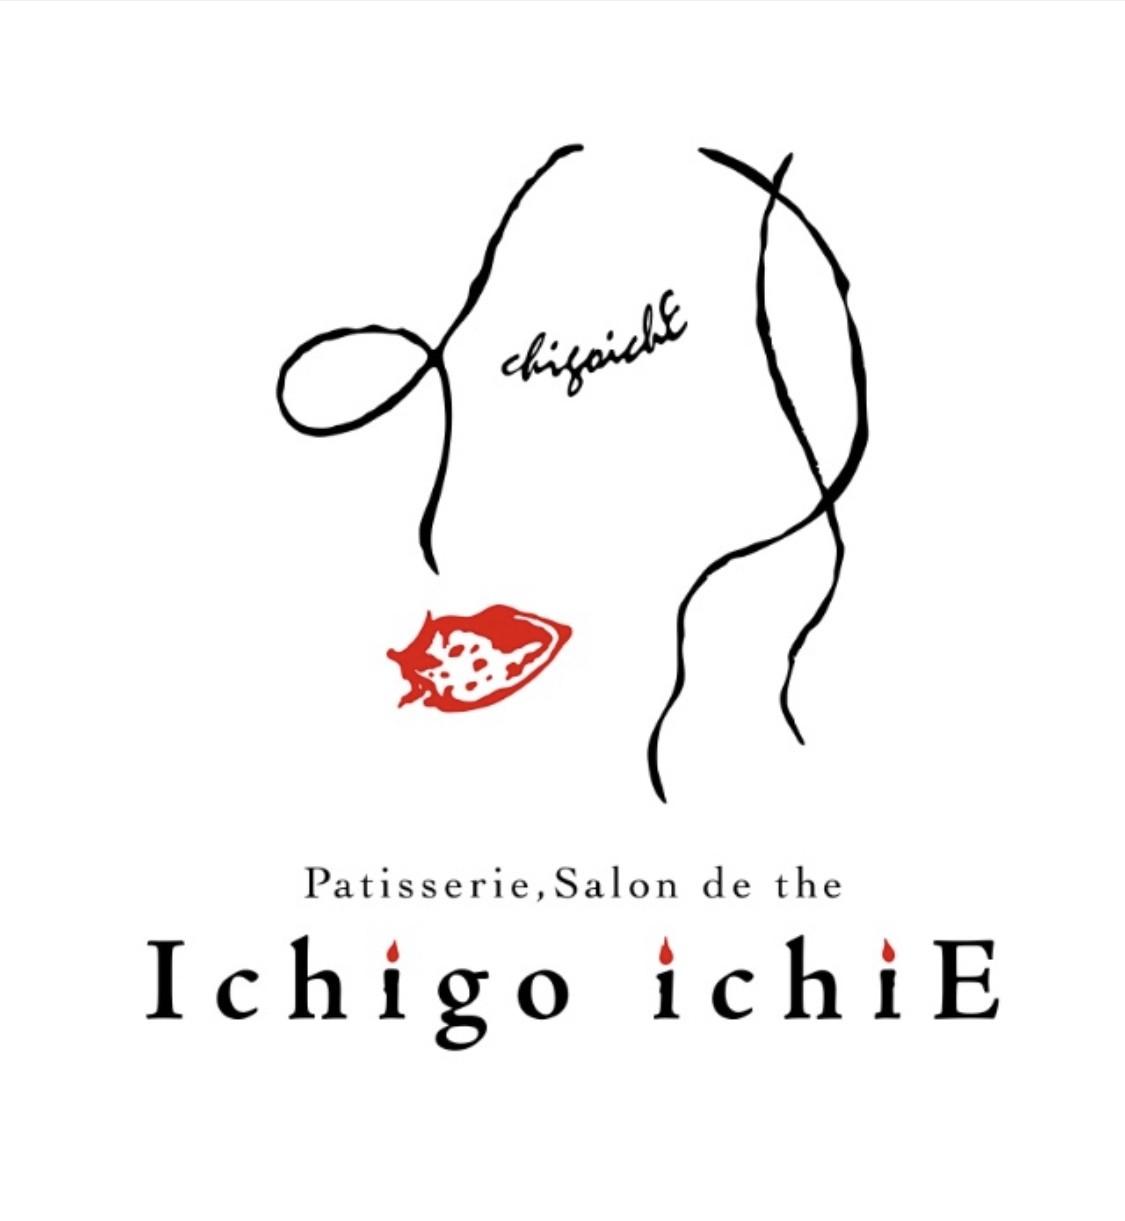 Pâtisserie Salon de the IchigoichiE BASEshop